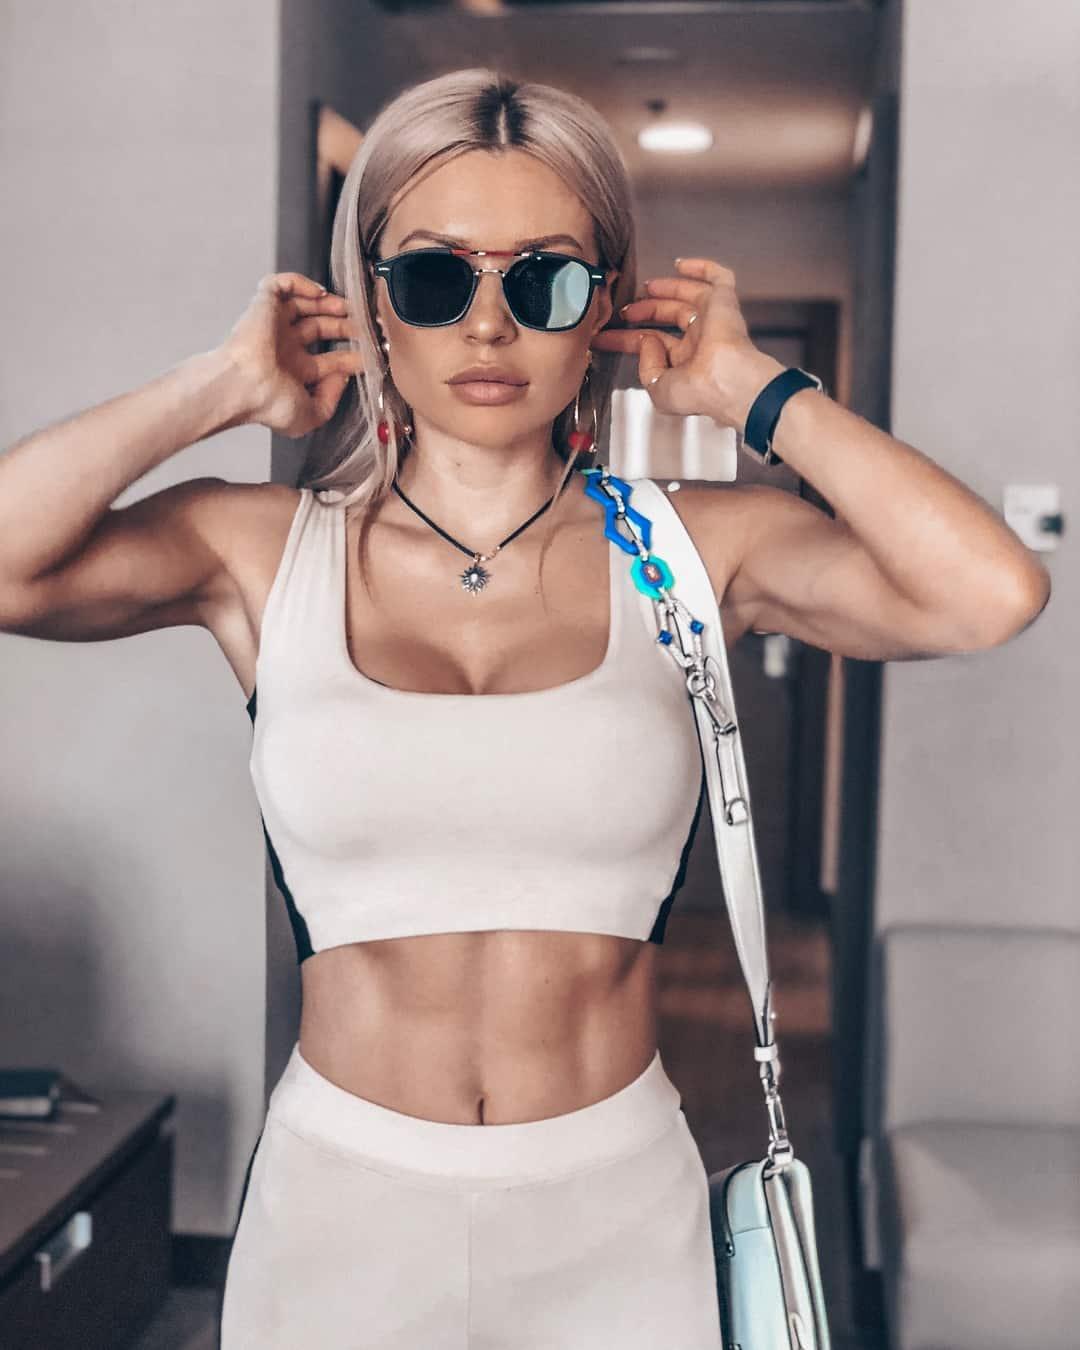 Ekaterina Usmanova curvy body